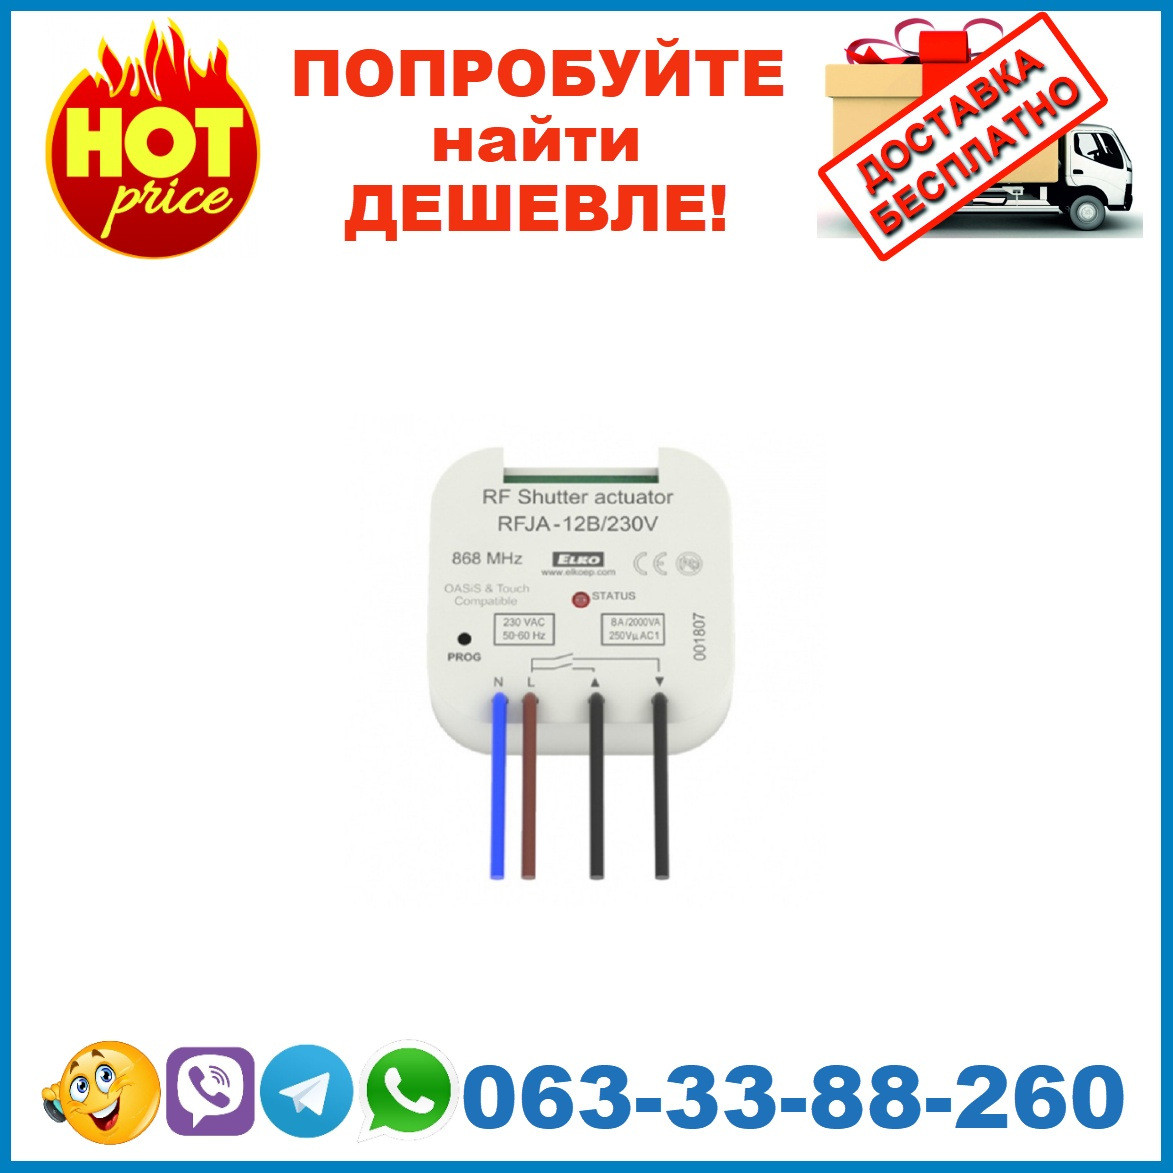 Модуль управления жалюзи iNELS RFJA-12B/230